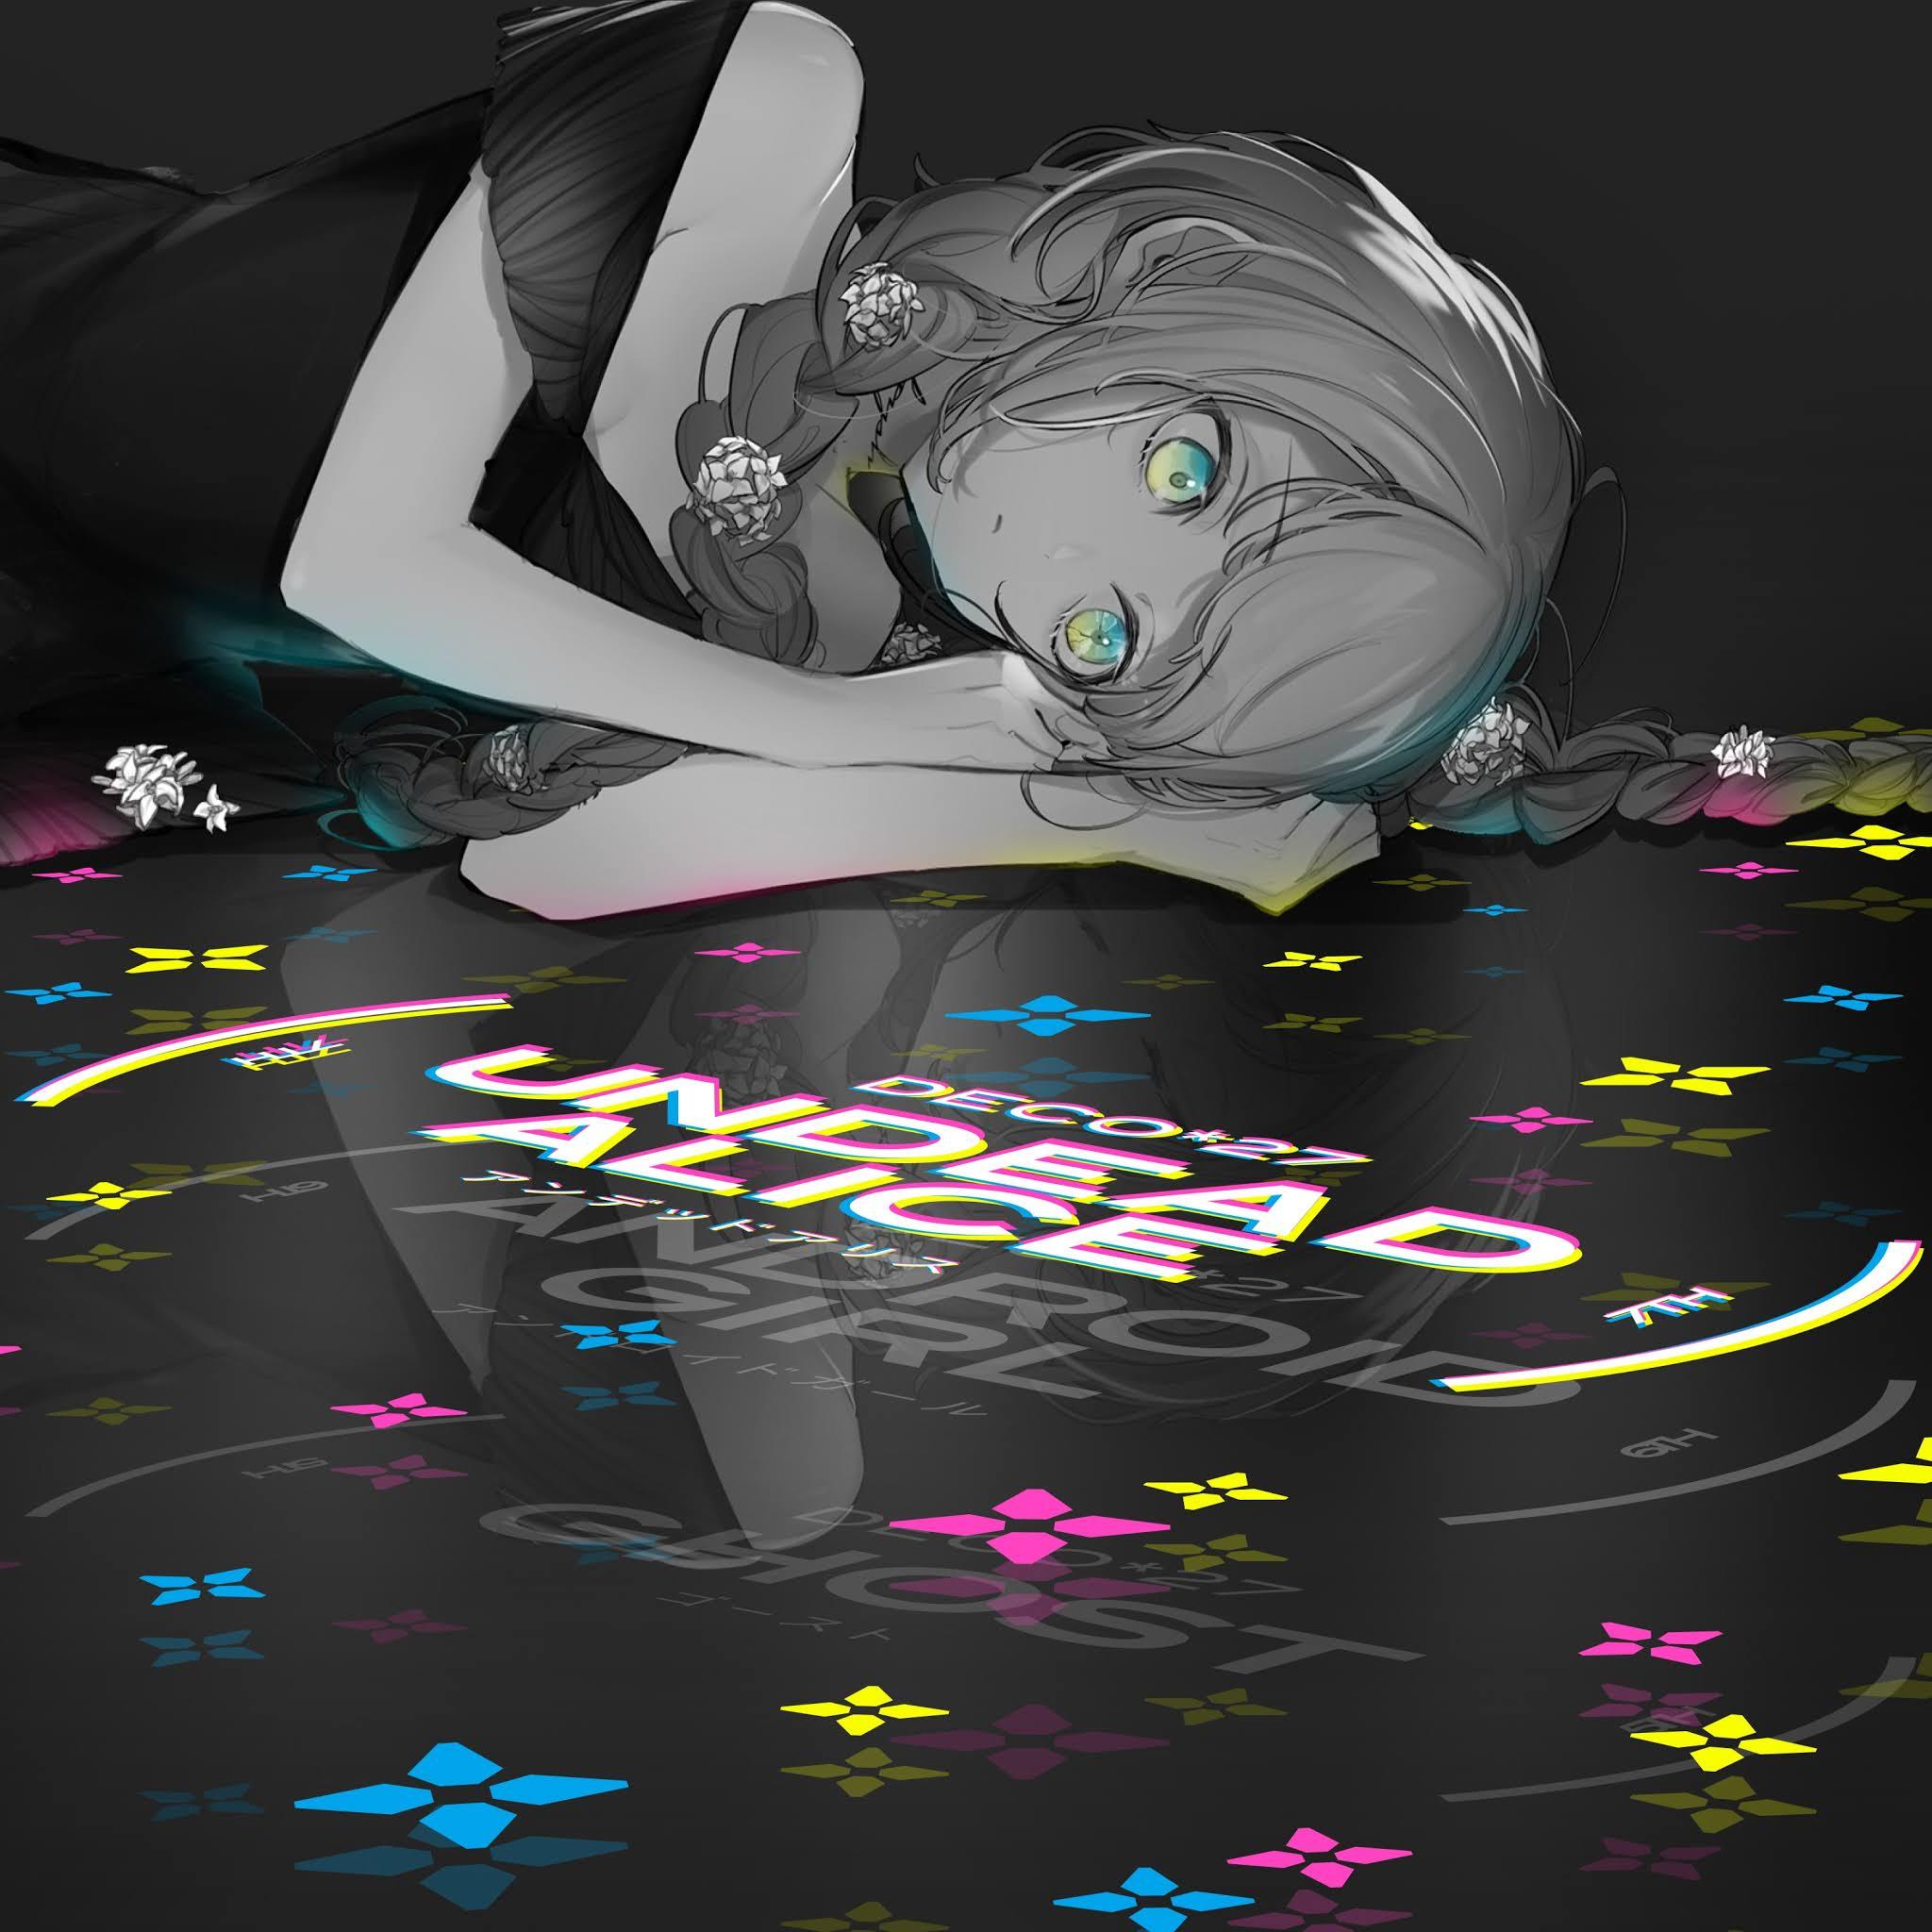 DECO*27 - Undead Alice